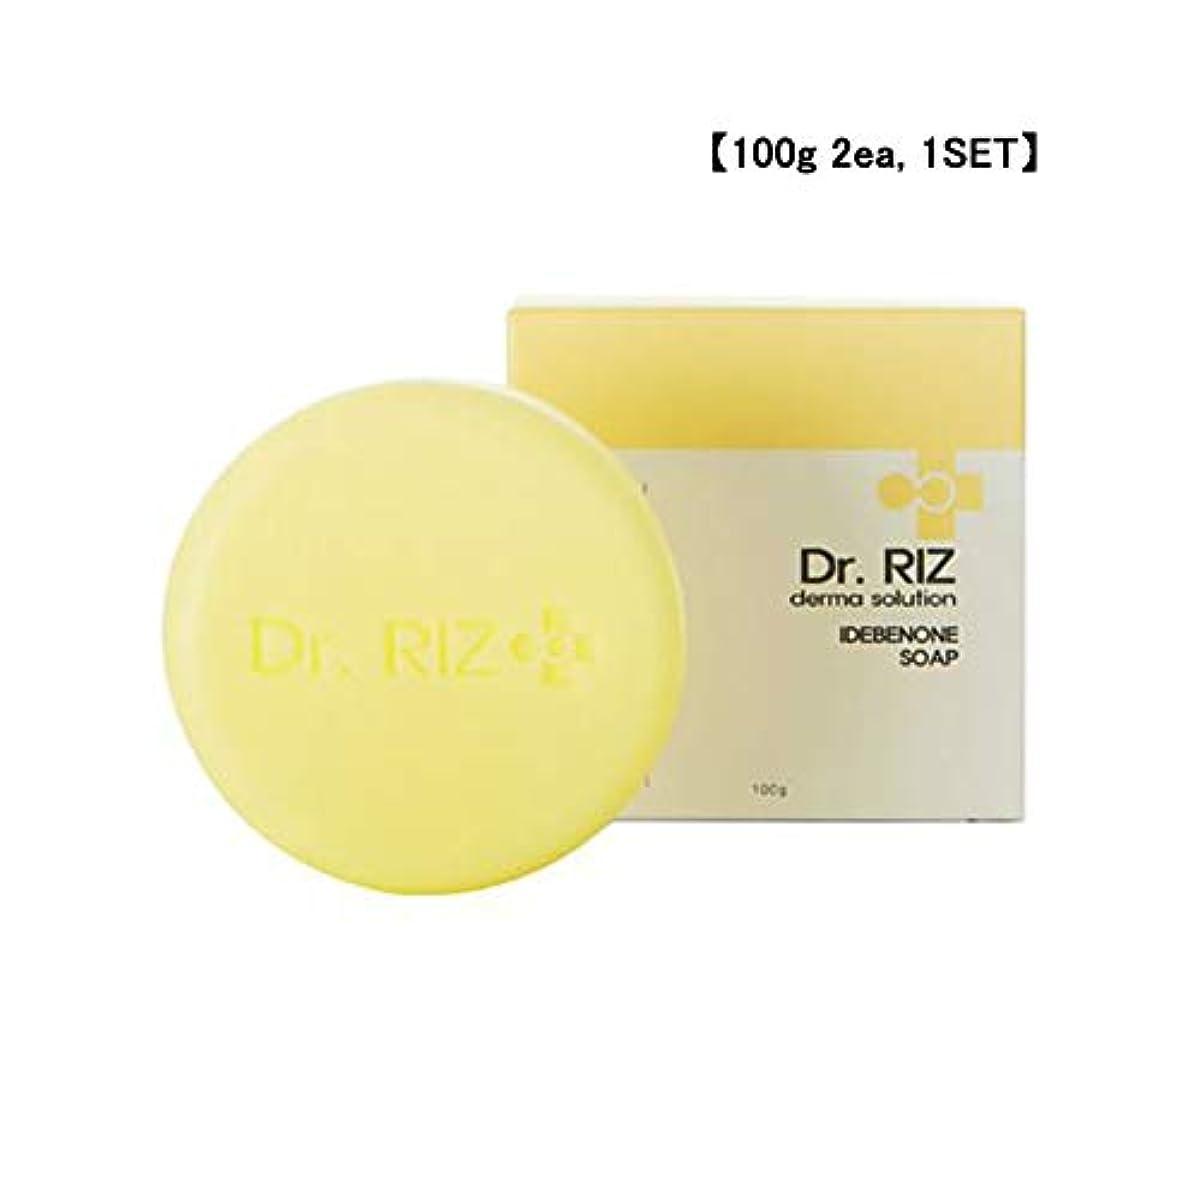 【Dr.RIZ]天然手作り石鹸/イーベノン10,000ppm含有/英国オーガニック認定原料ローズヒップオイル配合/Derma solution [並行輸入品] (100g 2ea)